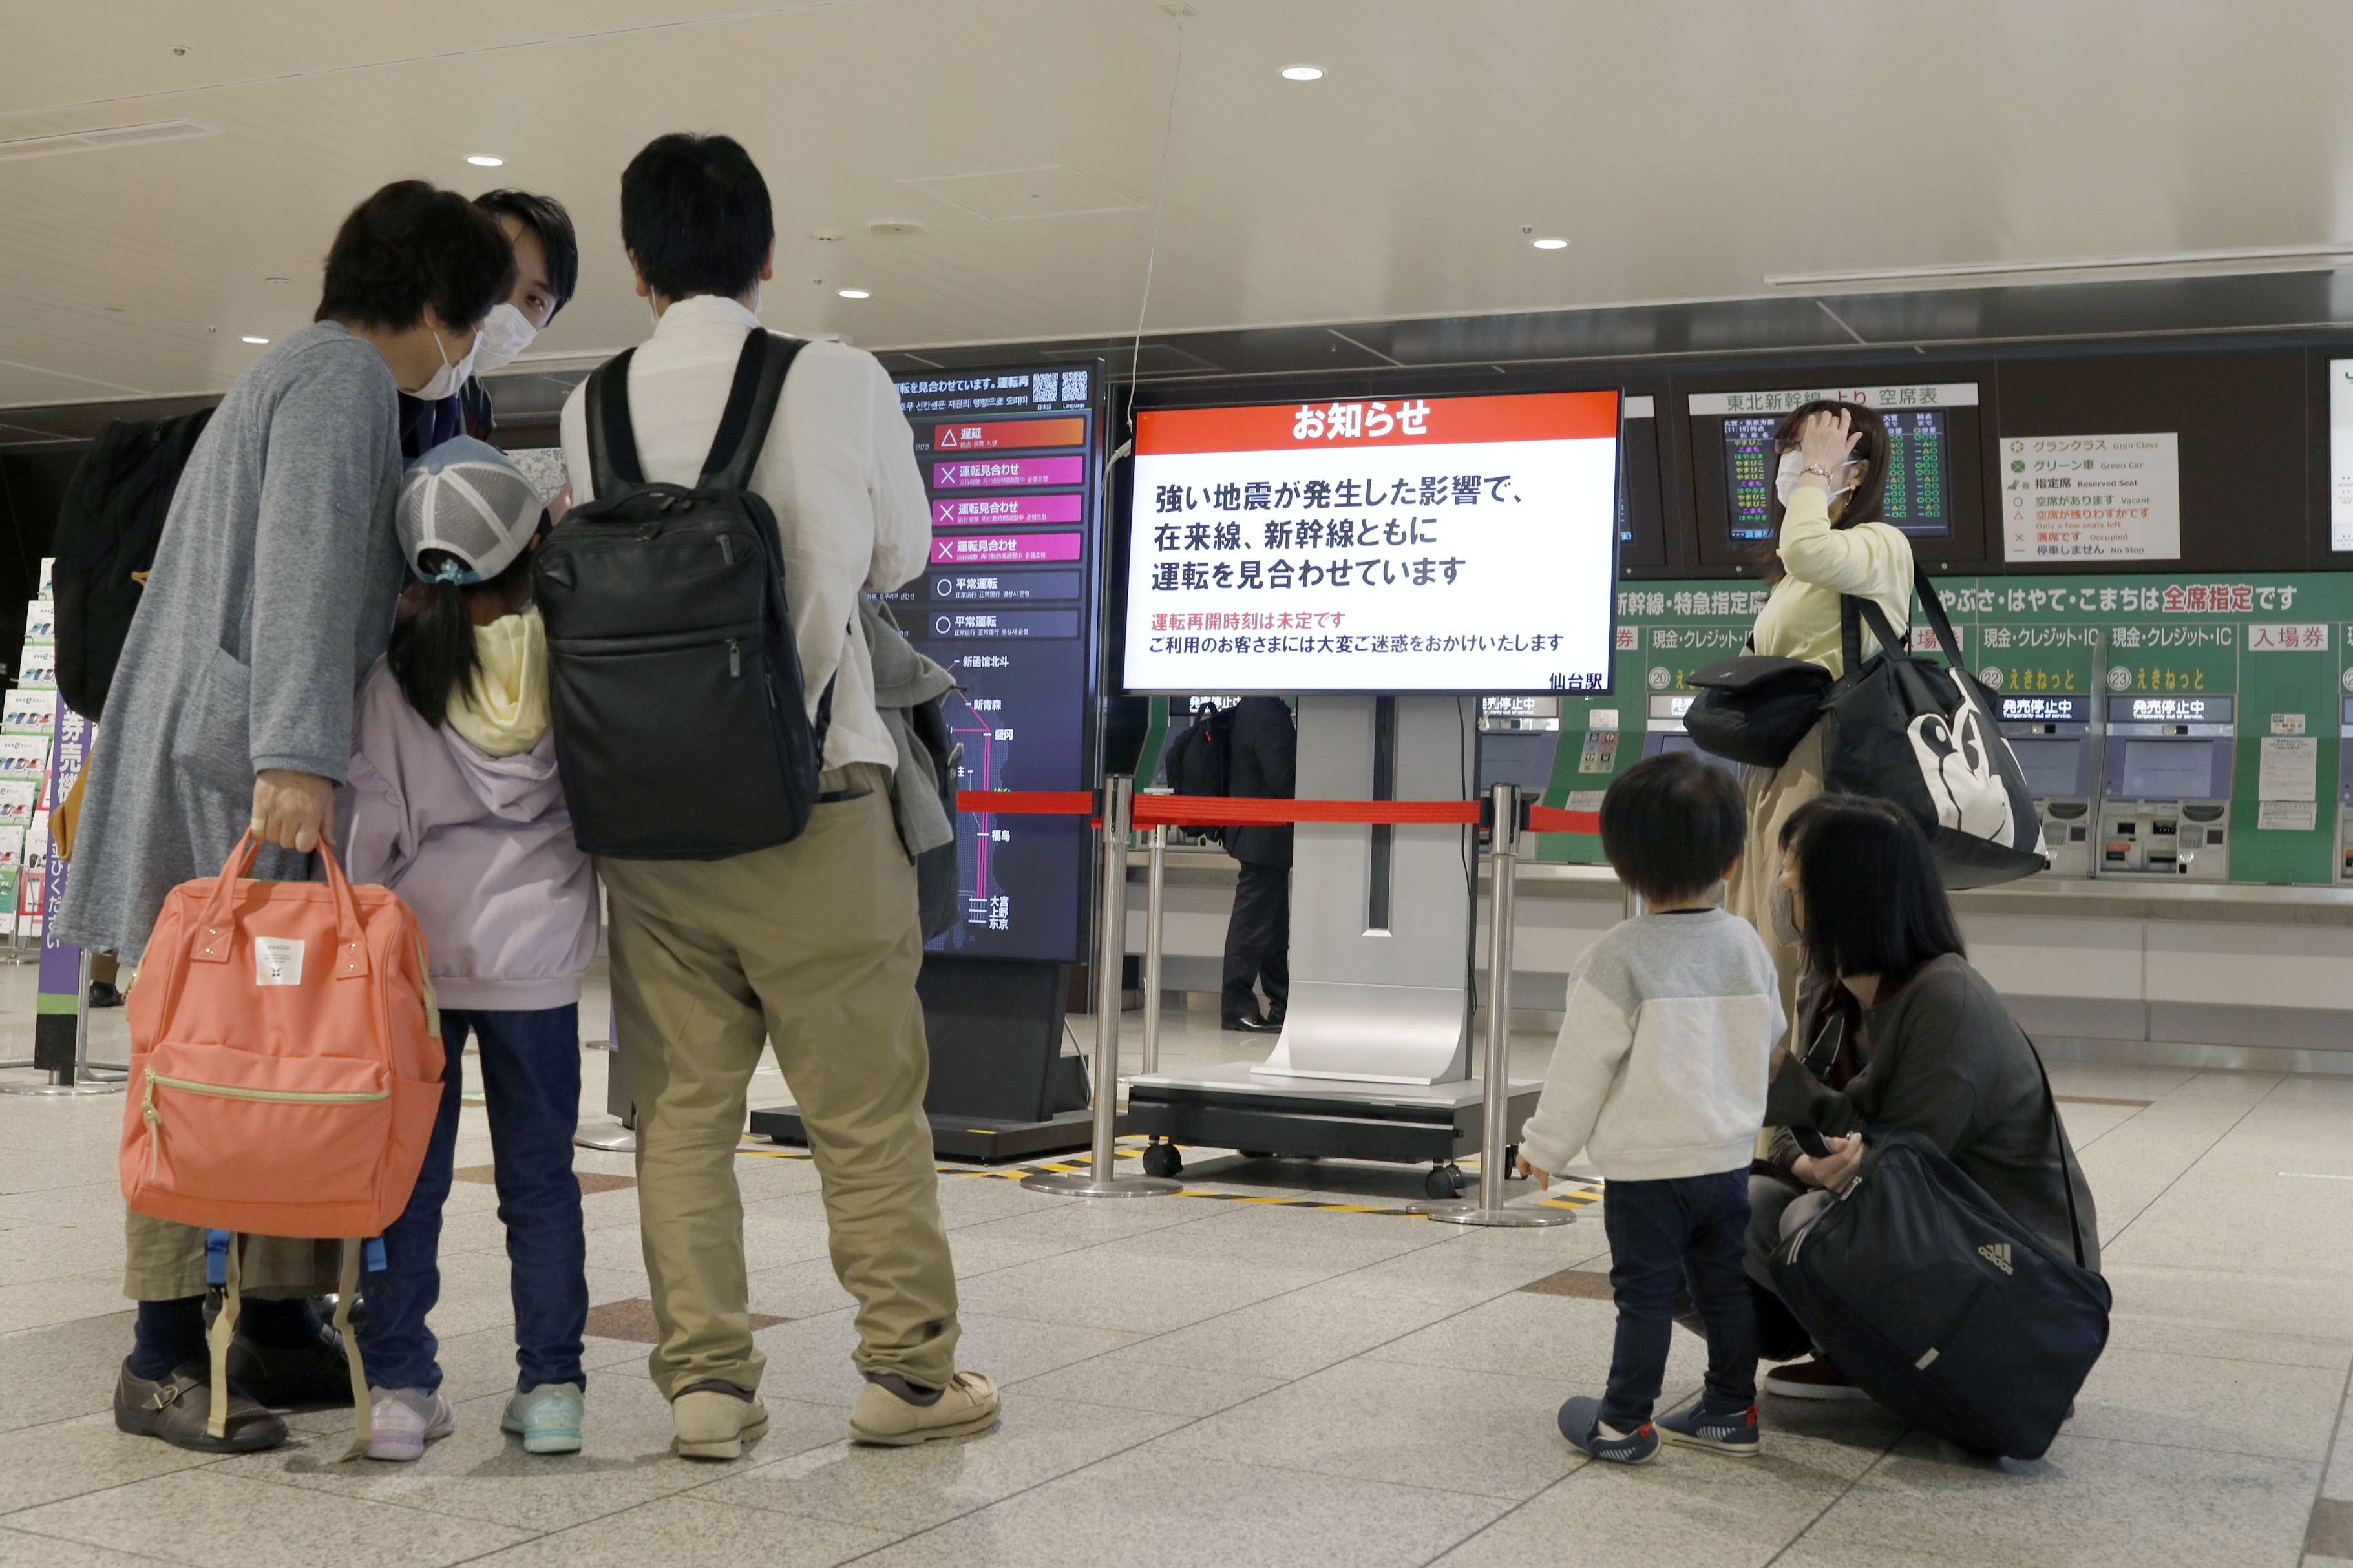 2021-05-01T040351Z_2074561555_RC2S6N9I3C4X_RTRMADP_3_JAPAN-QUAKE.JPG